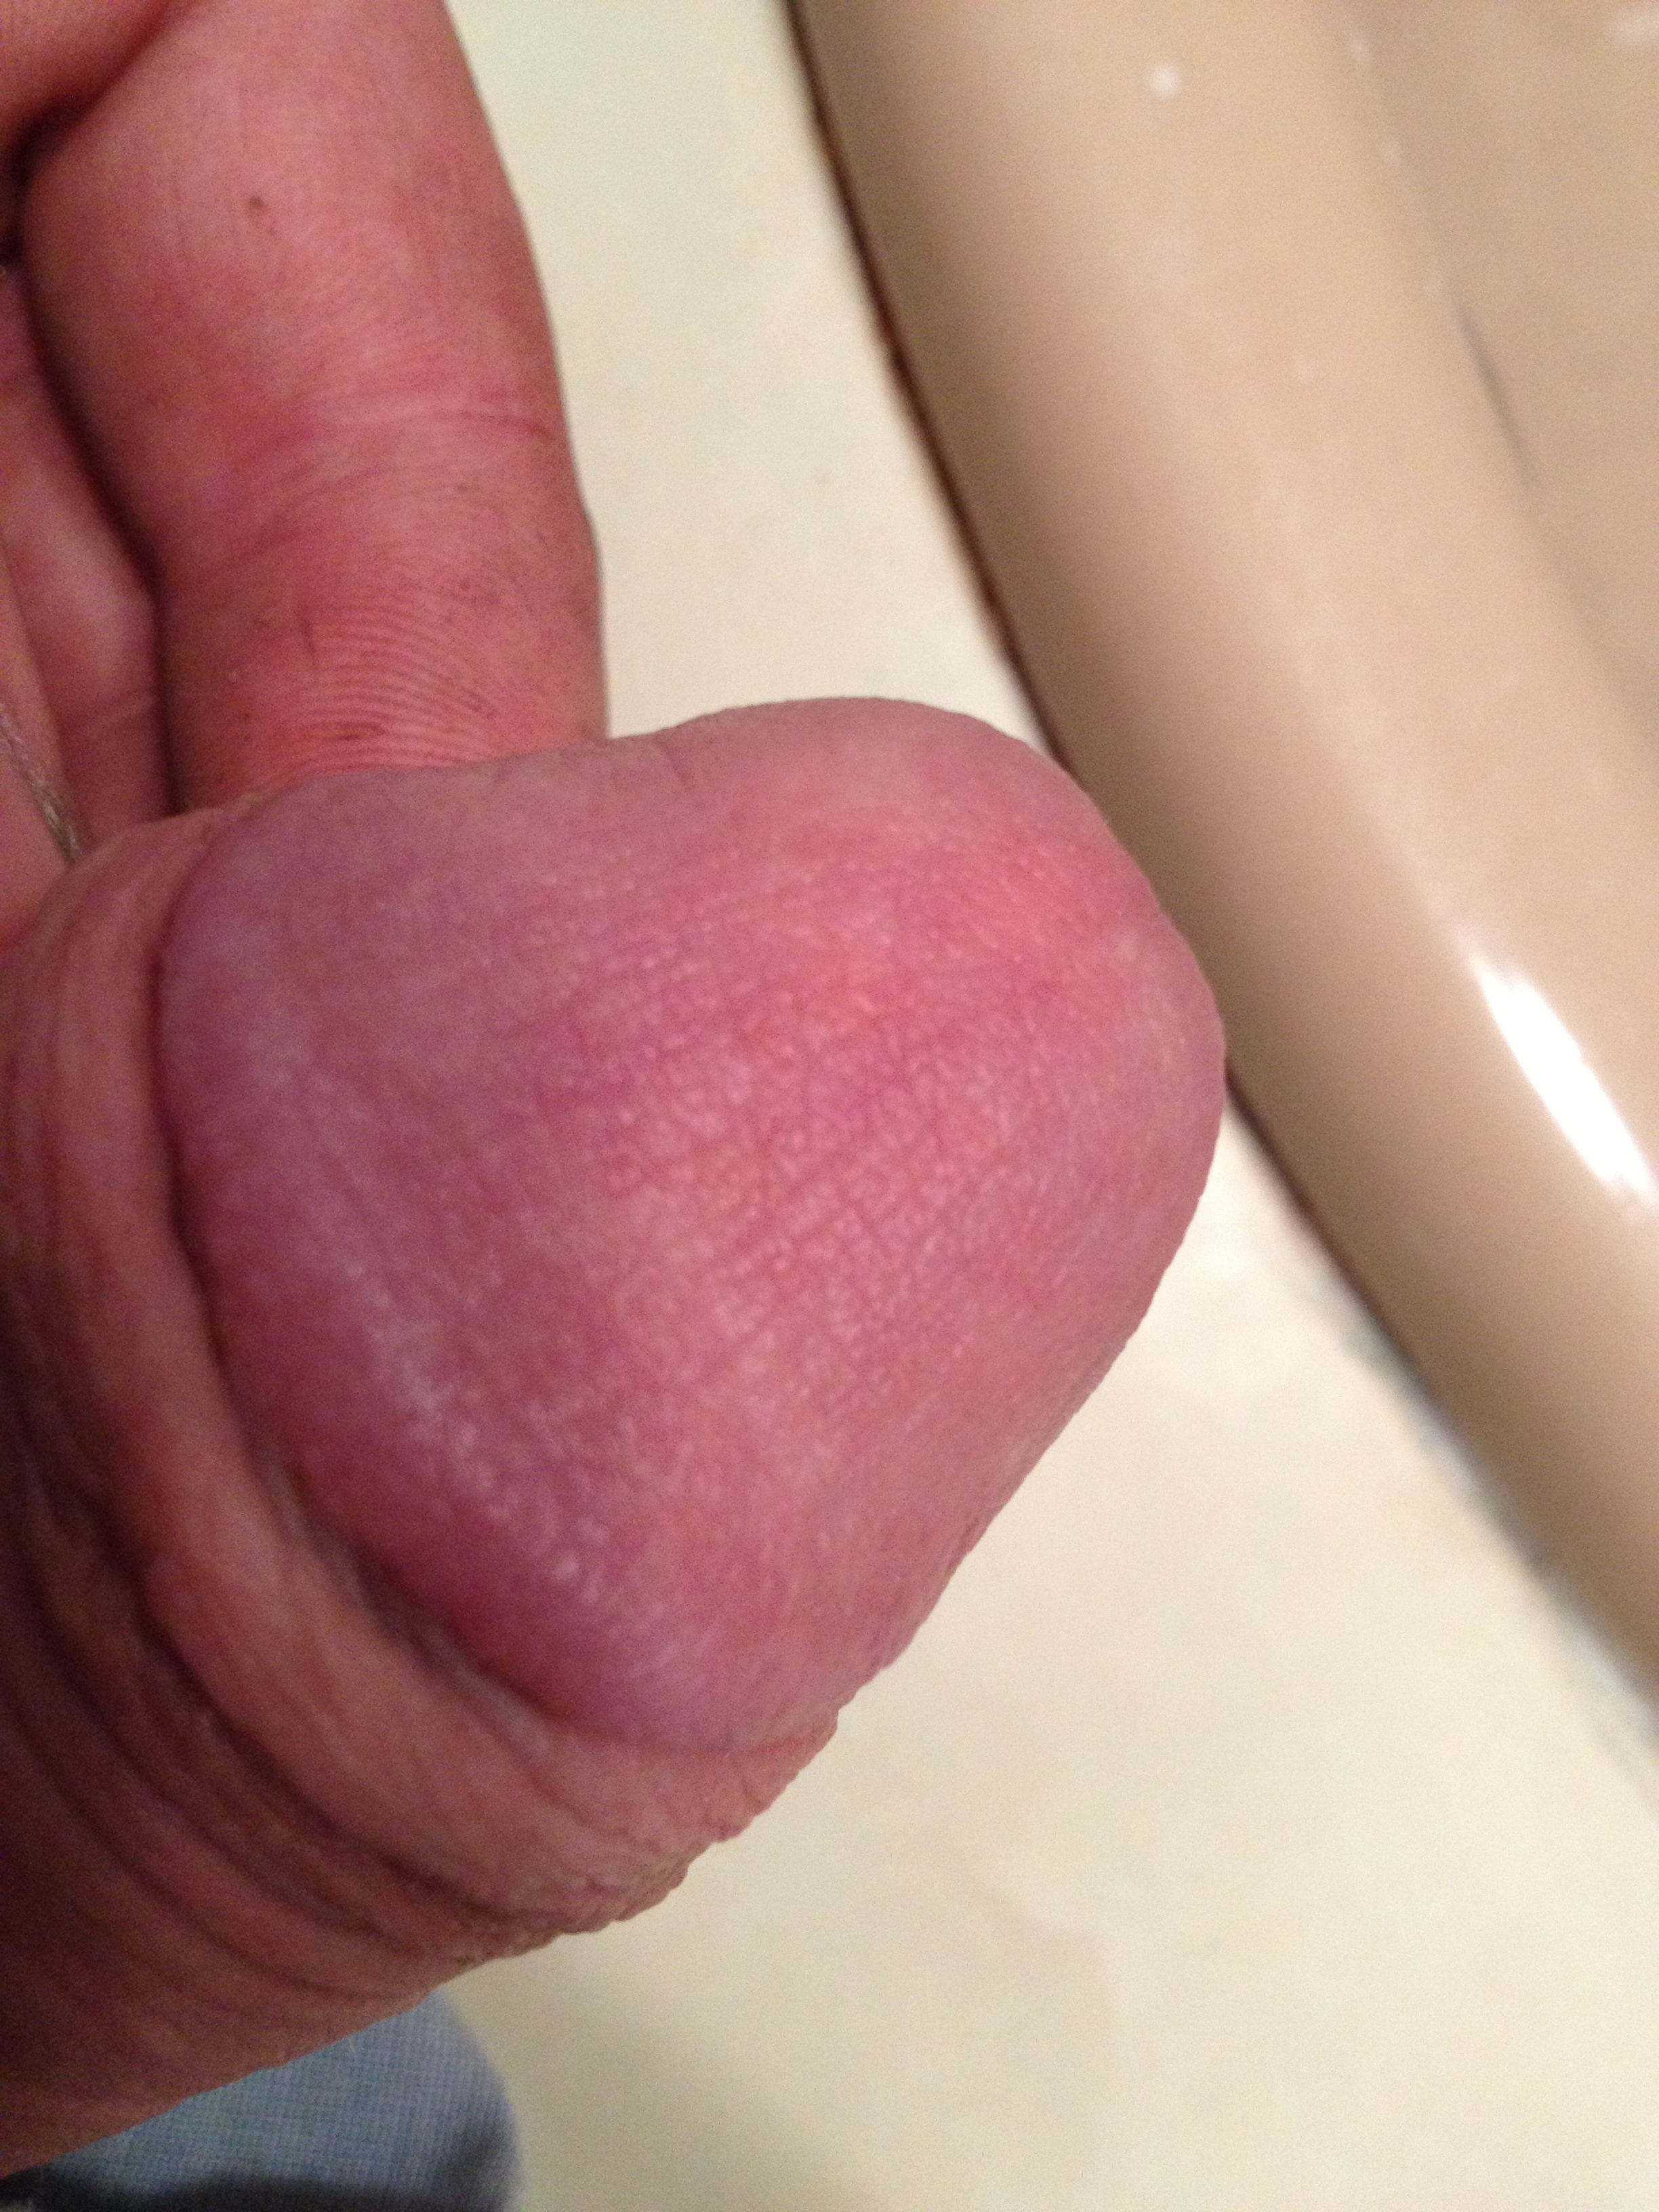 Red irritated skin penis causes